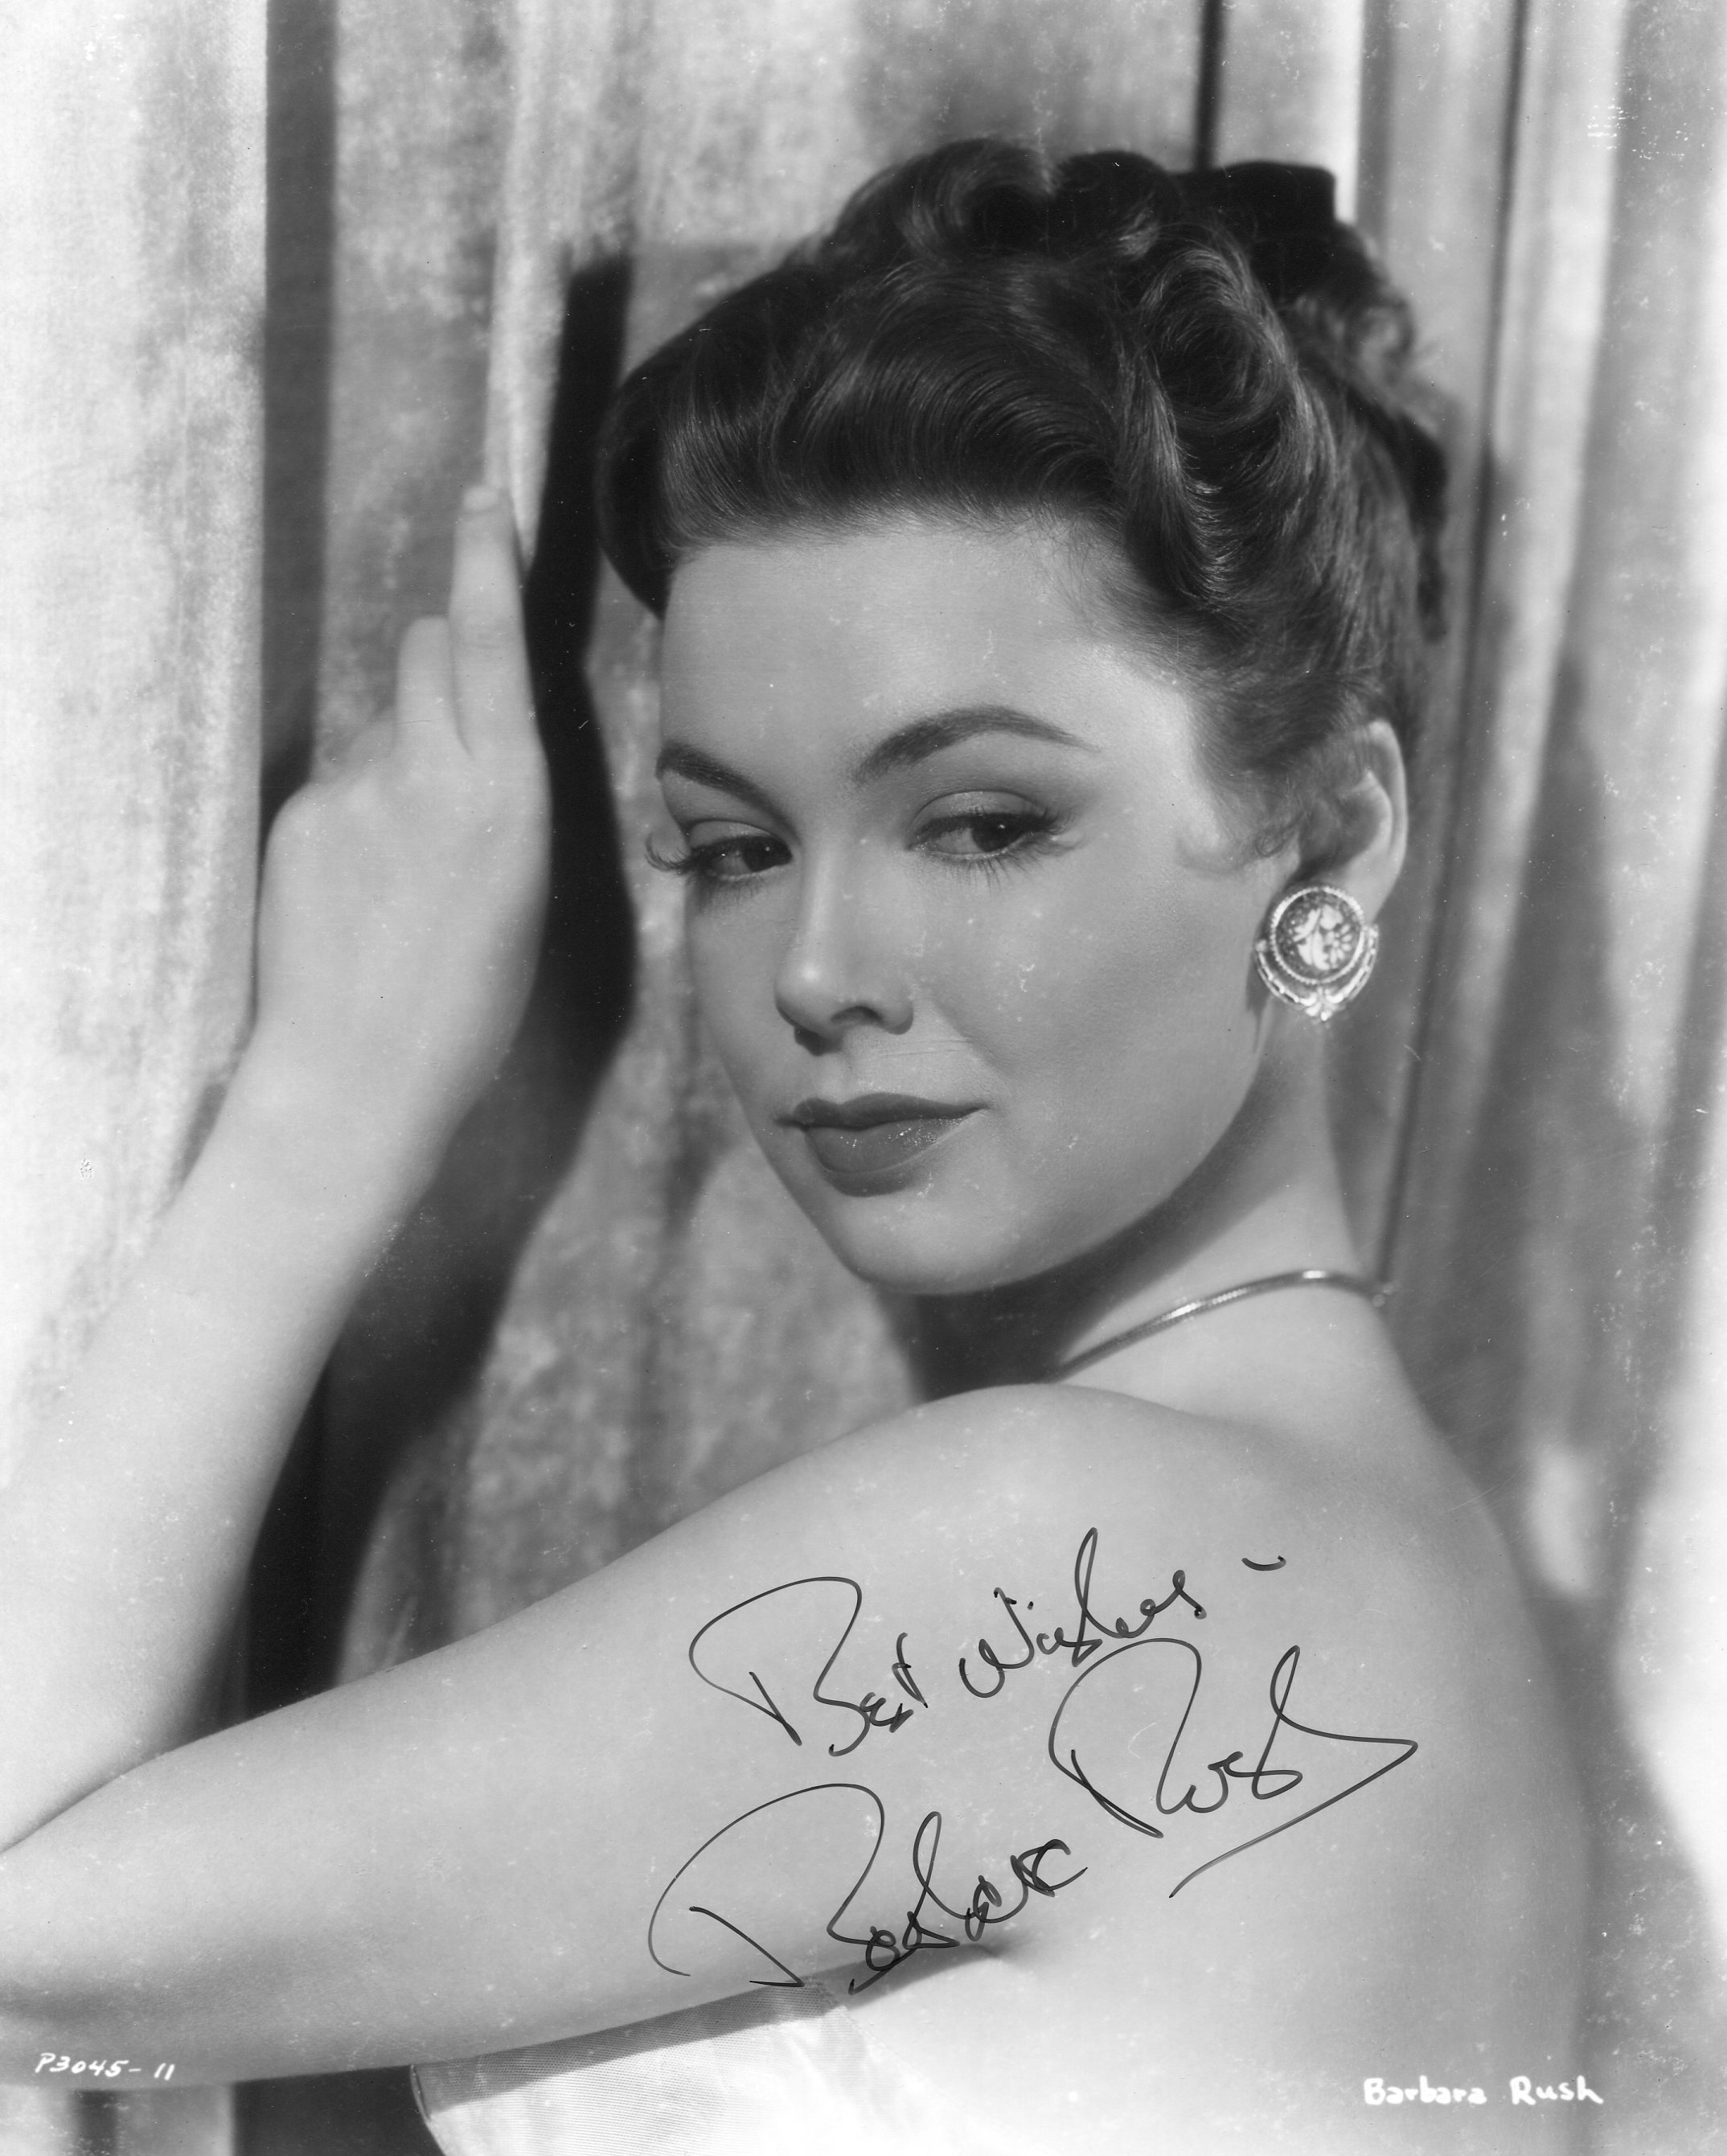 Barbara rush movies amp autographed portraits through the